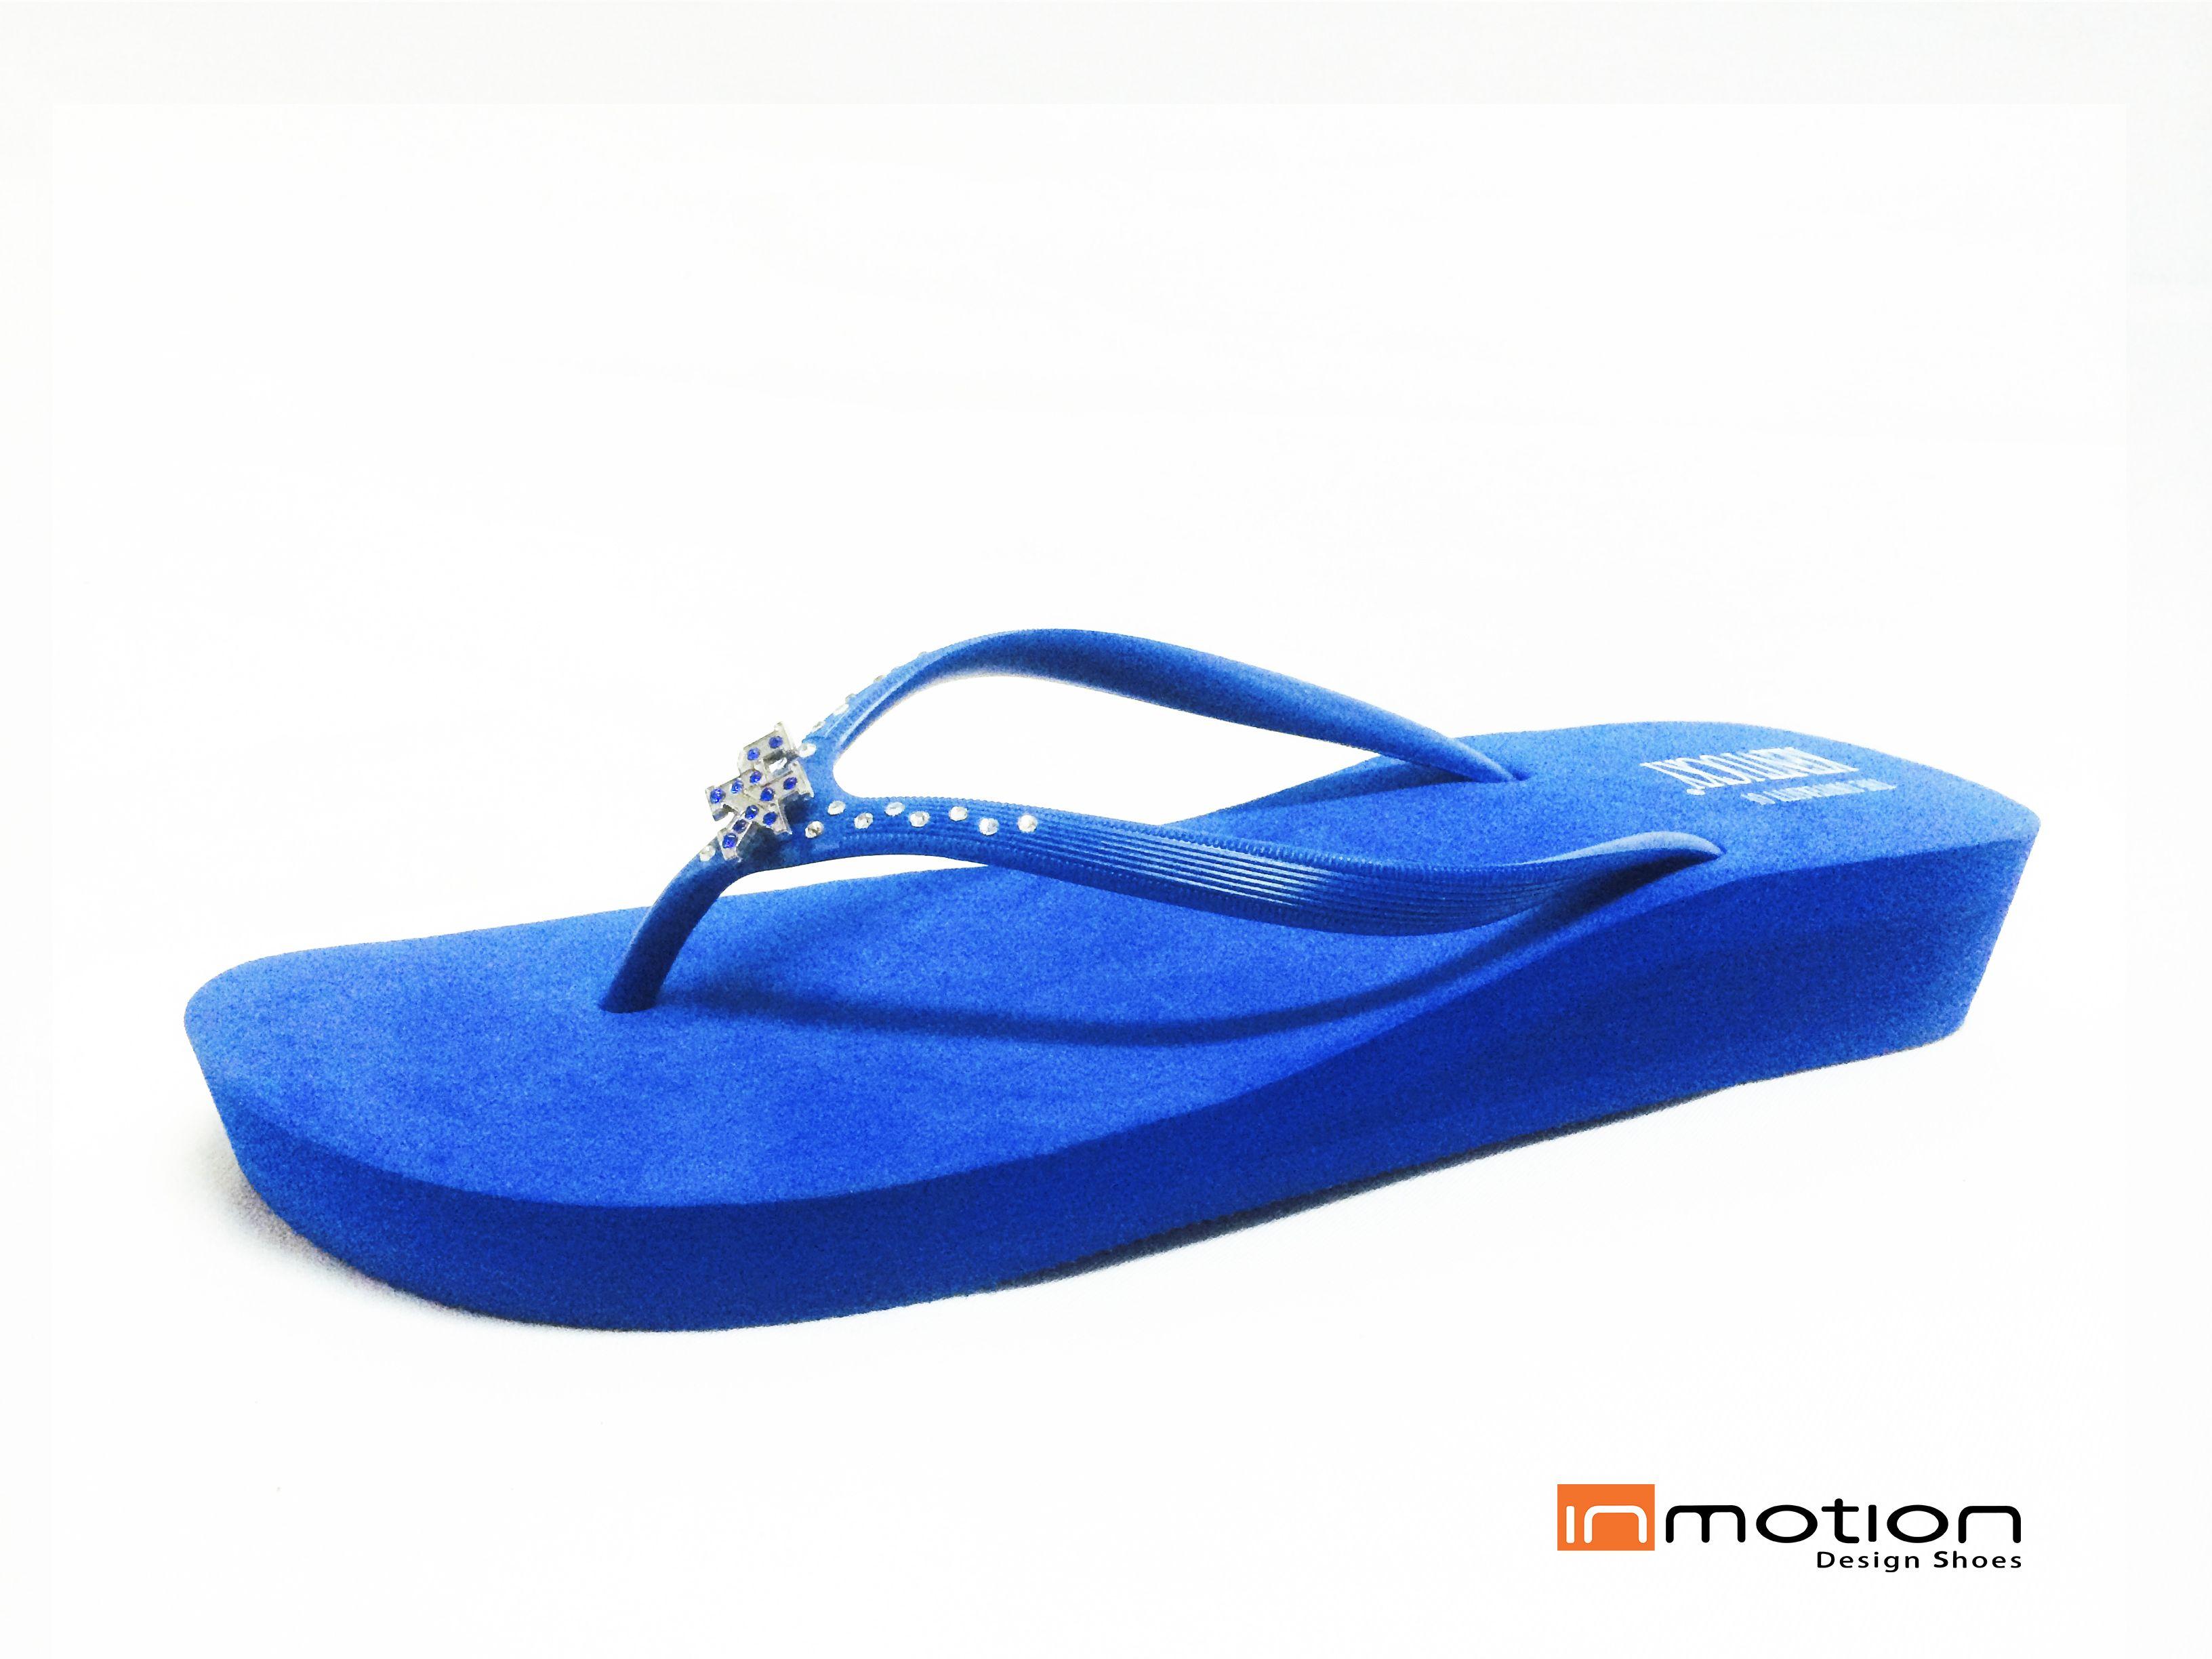 Dale colorido a tus vacaciones... ¡Azul Pavo!